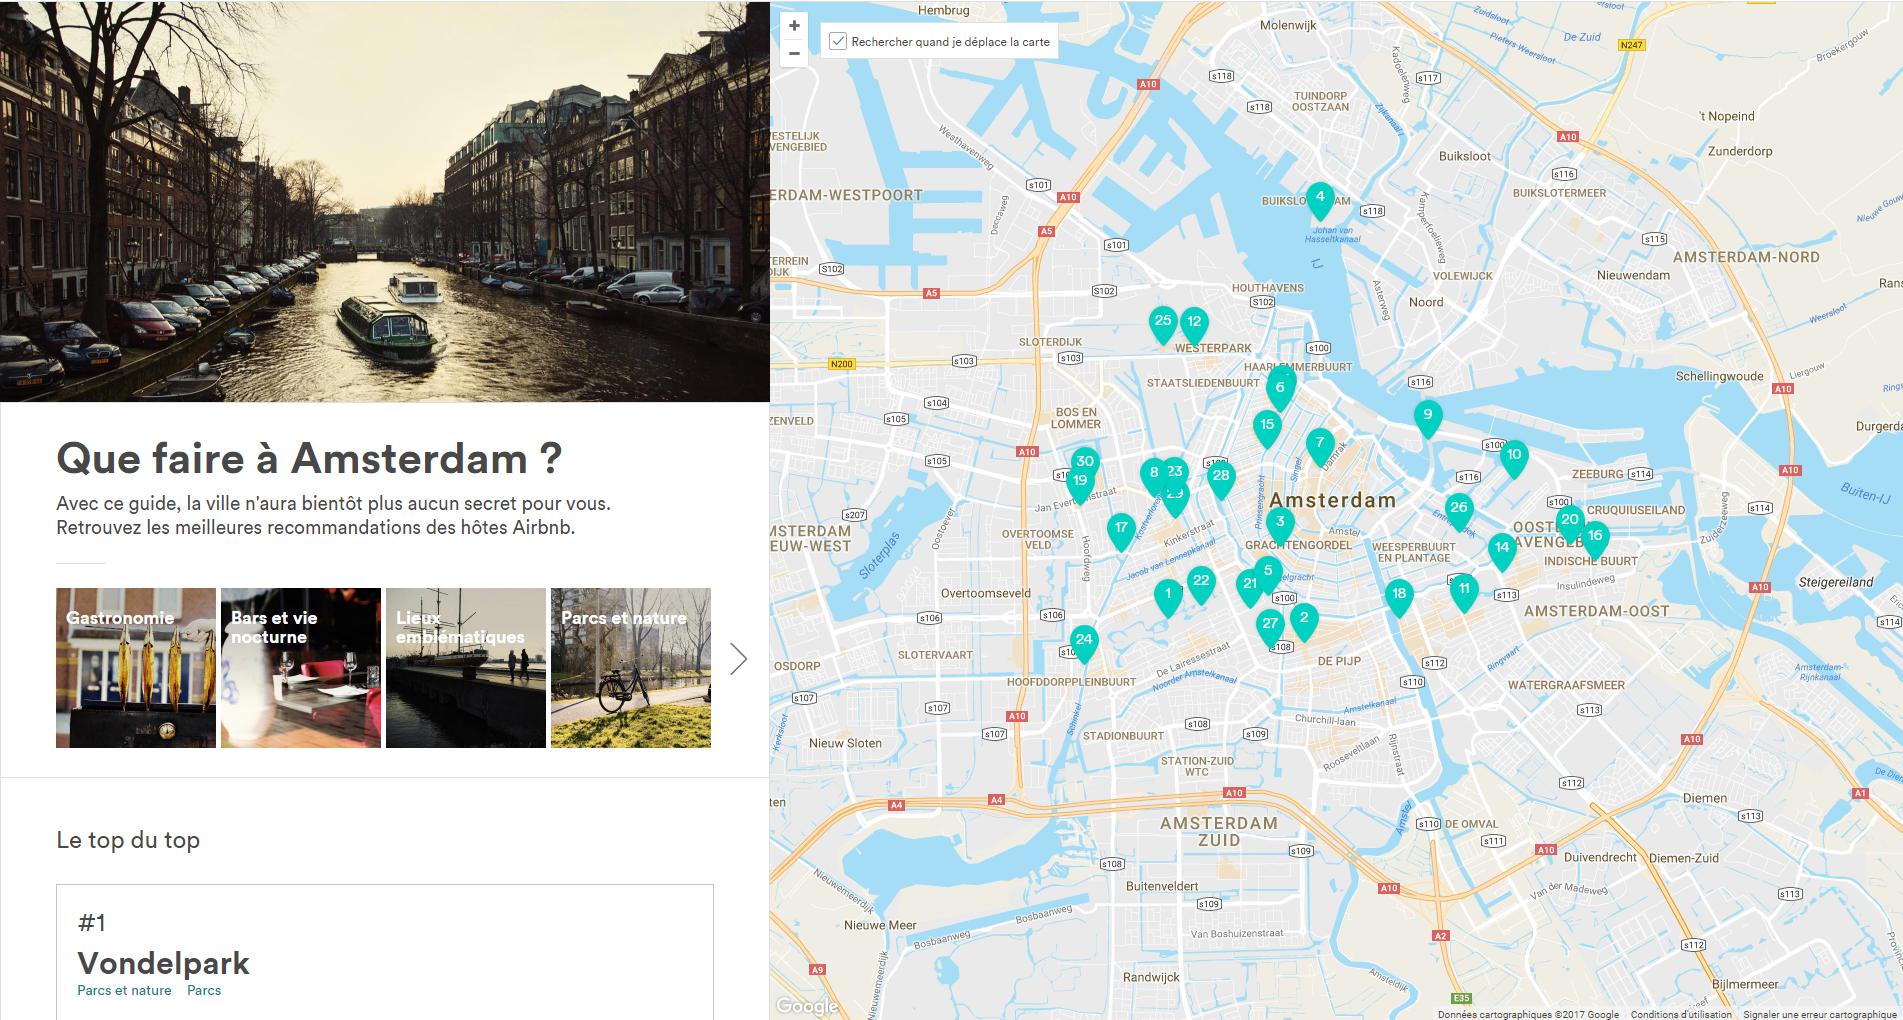 Guide touristique airbnb